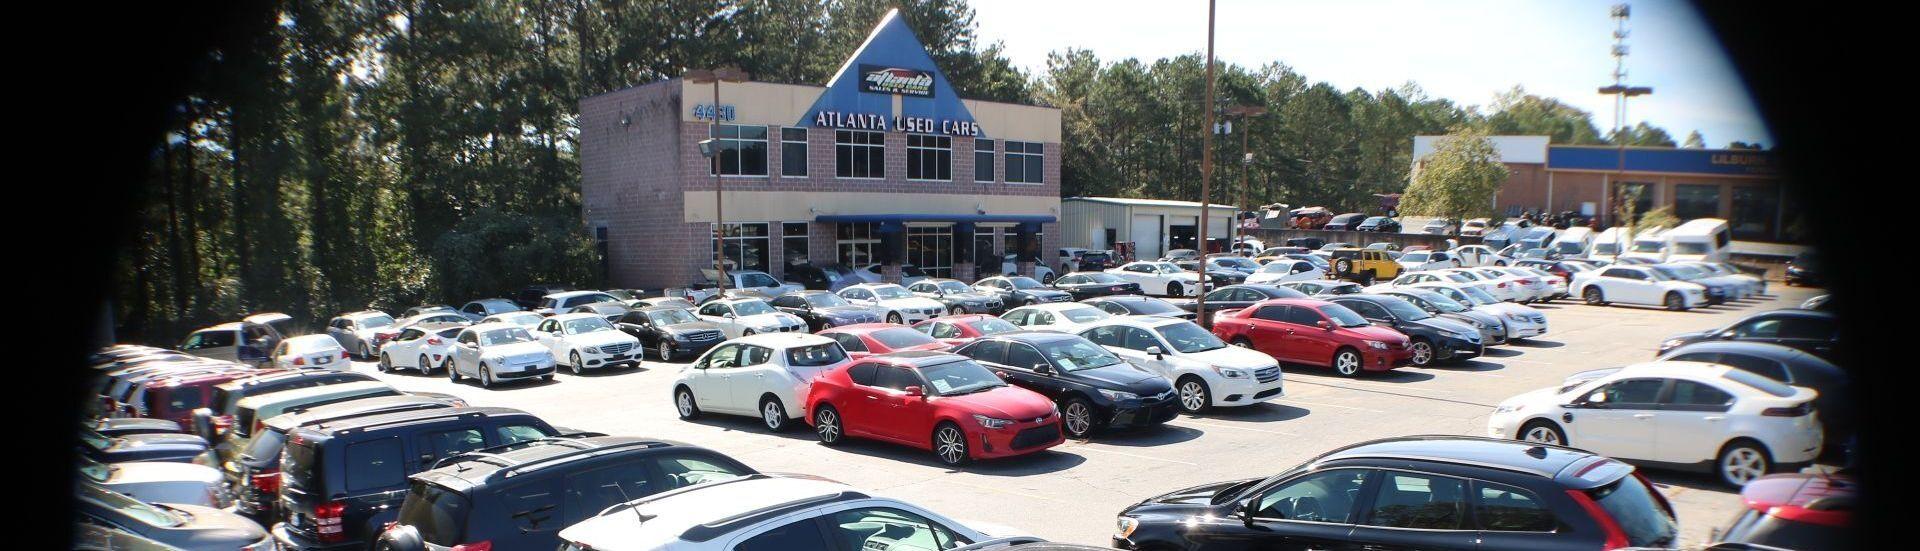 Used Car Dealership Lilburn Ga Atlanta Used Cars Sales